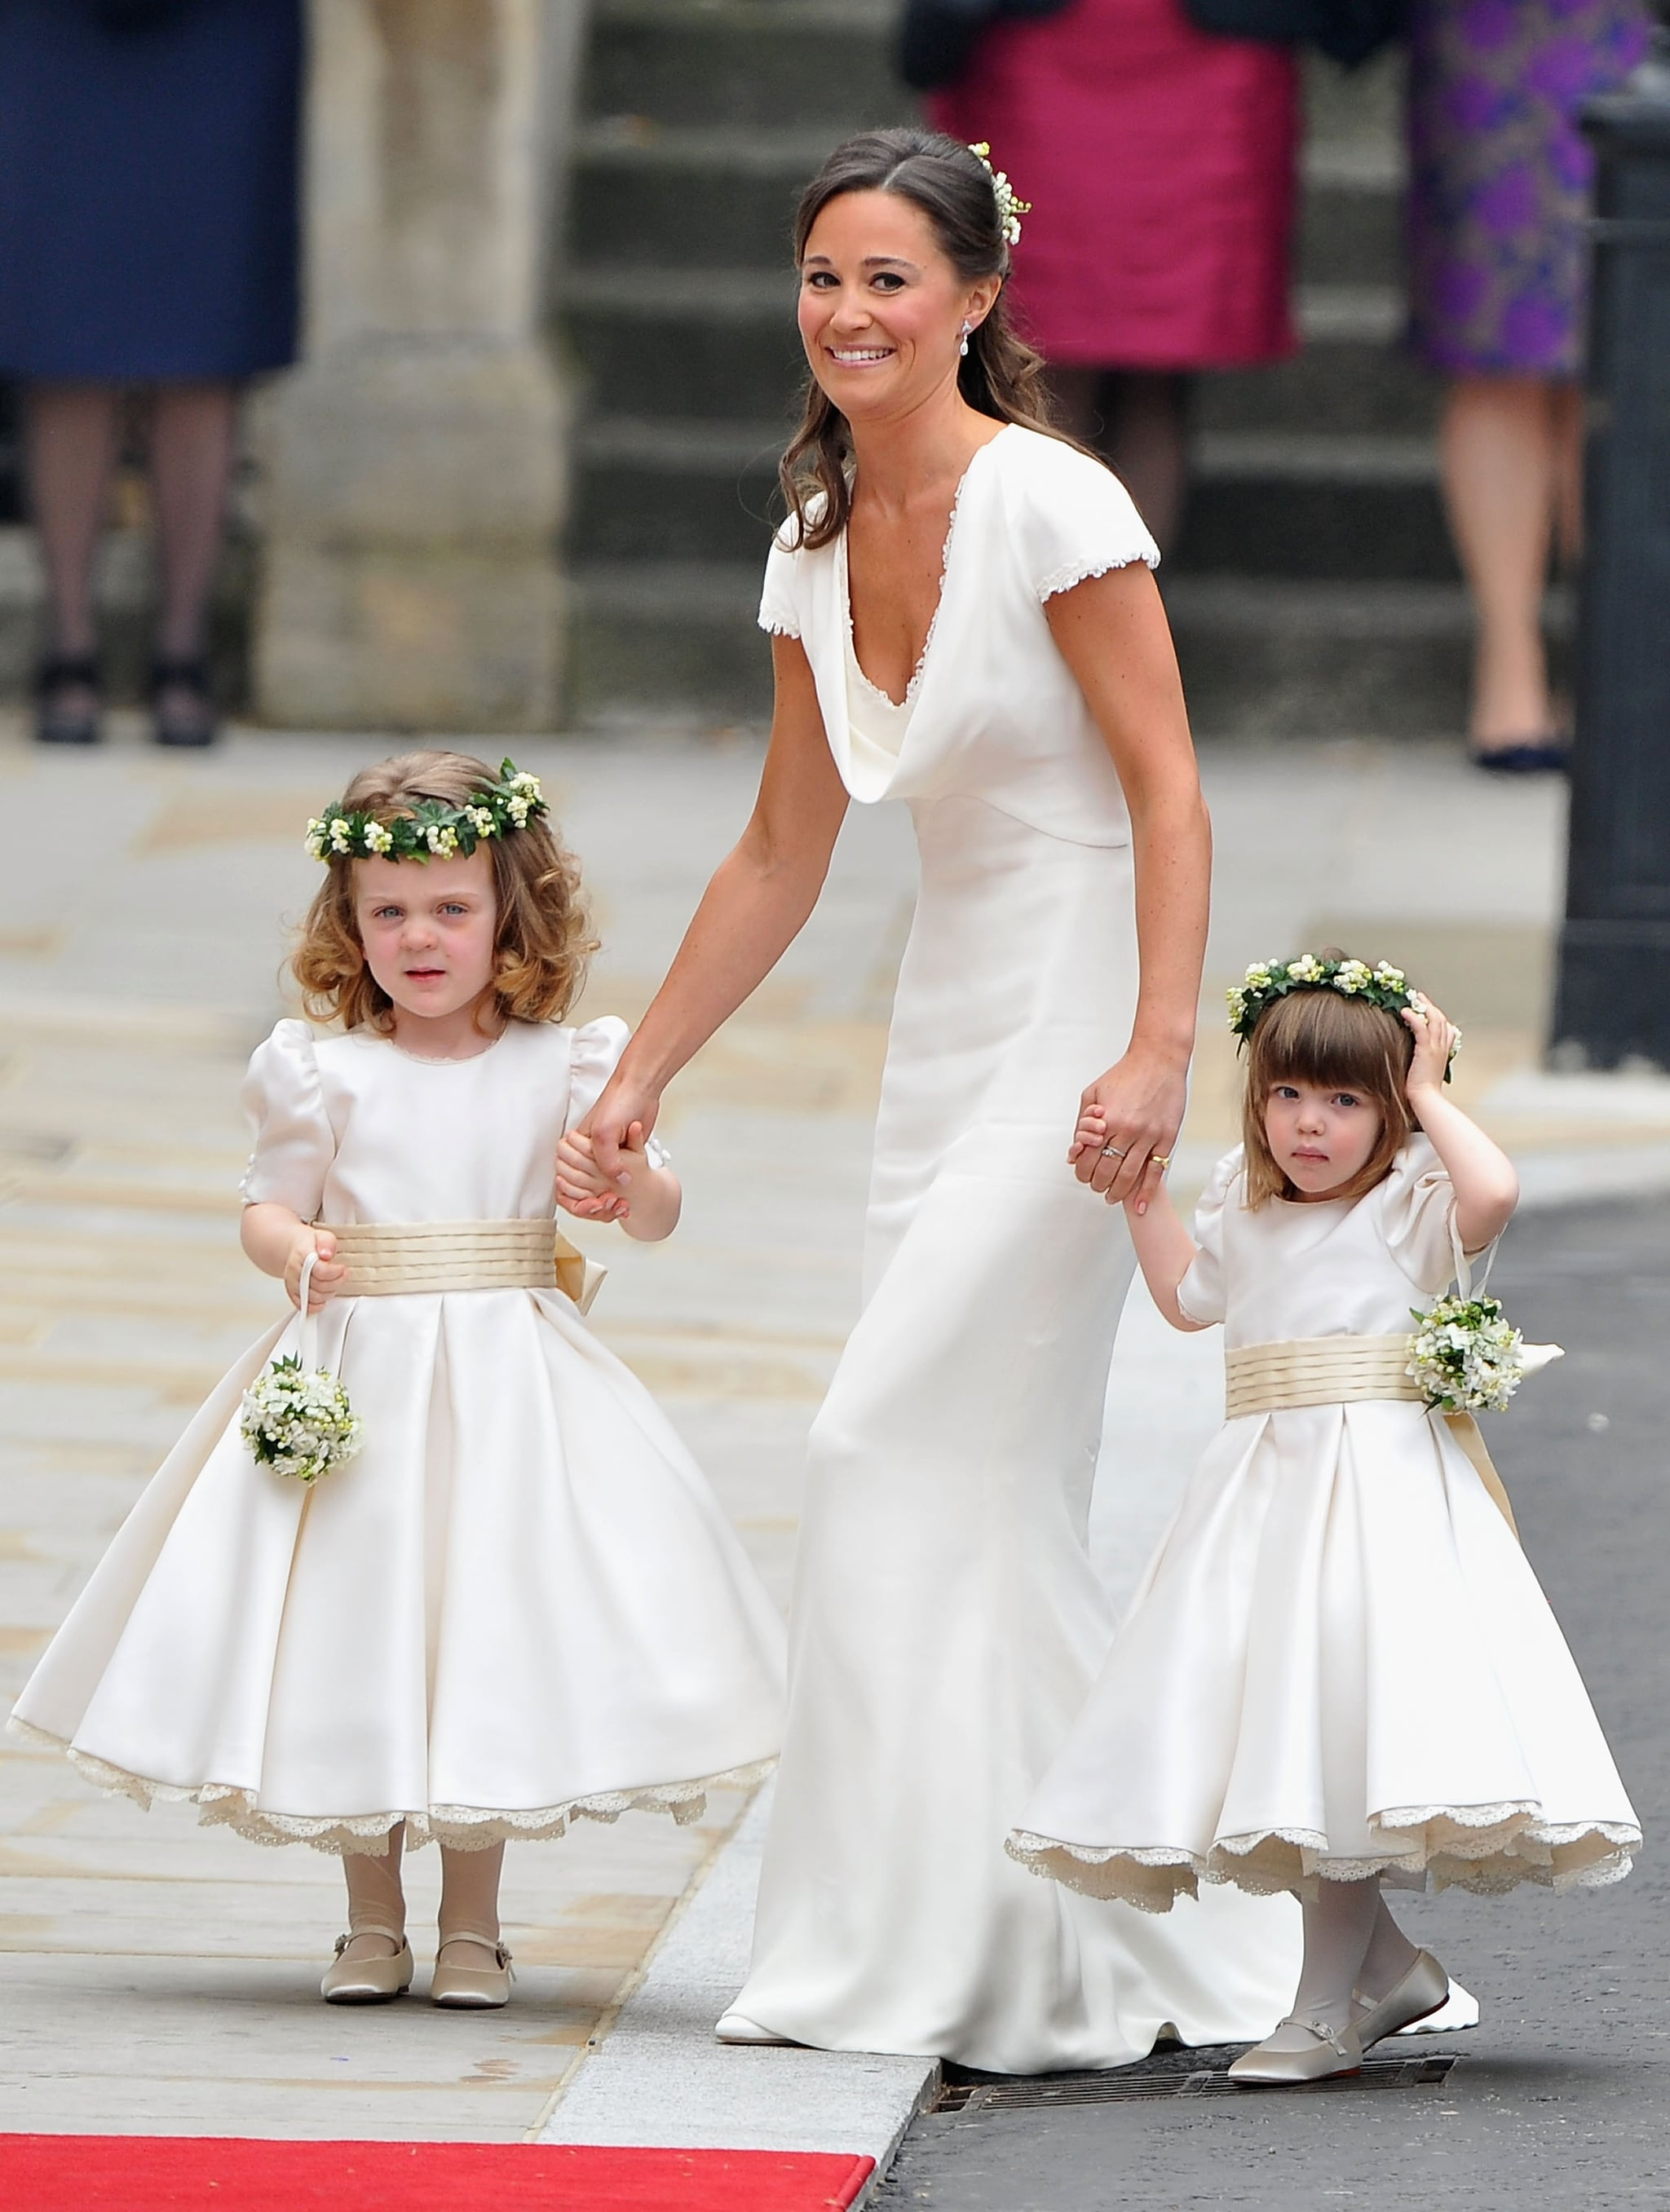 Royal Wedding Bridesmaid Dresses 2 Fresh Share This Link